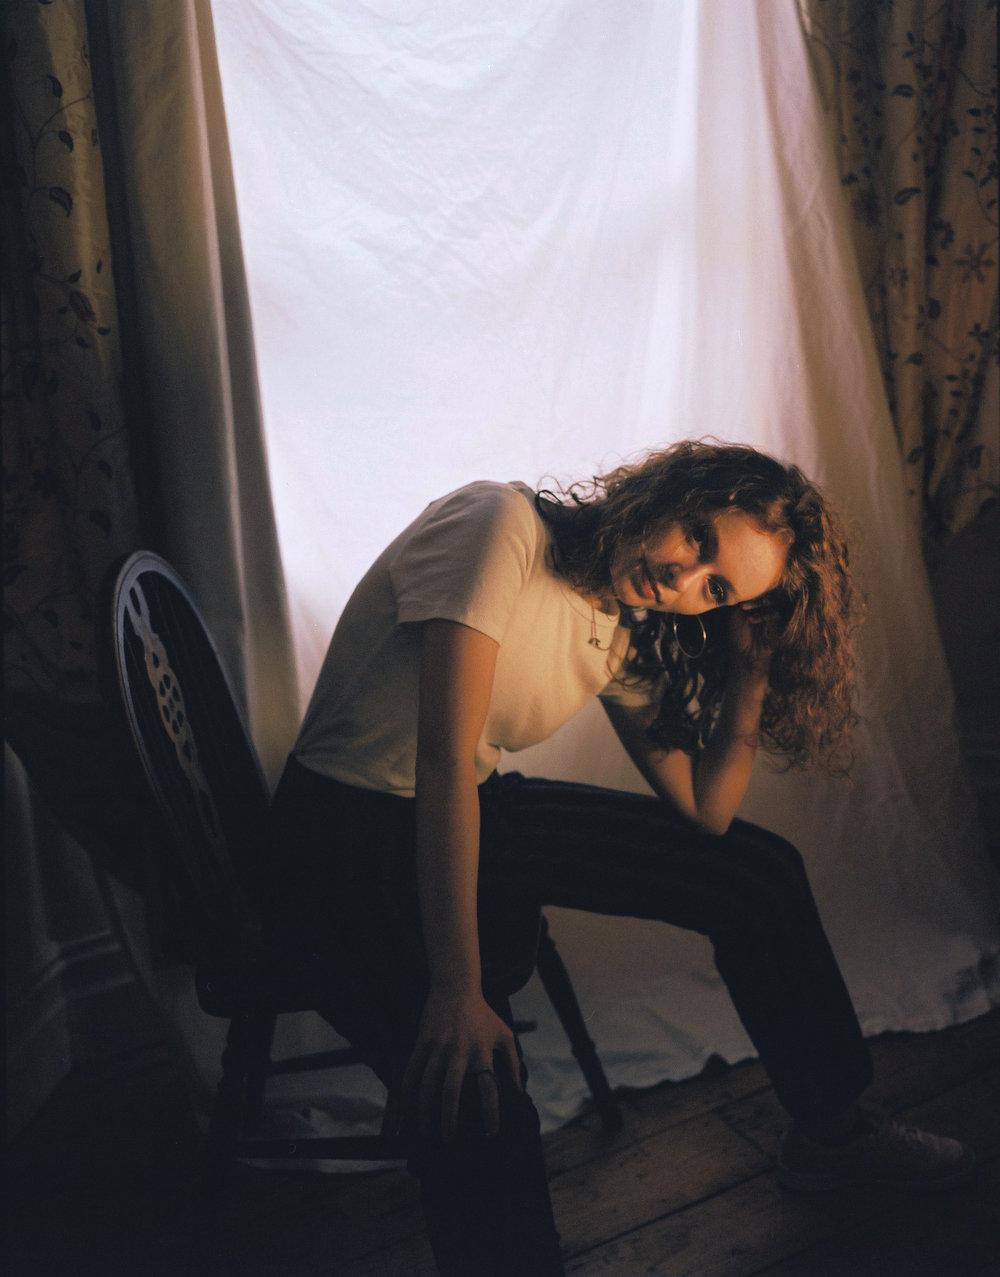 LUCY KINGHORN - The Vagina Series Chloe English.jpg